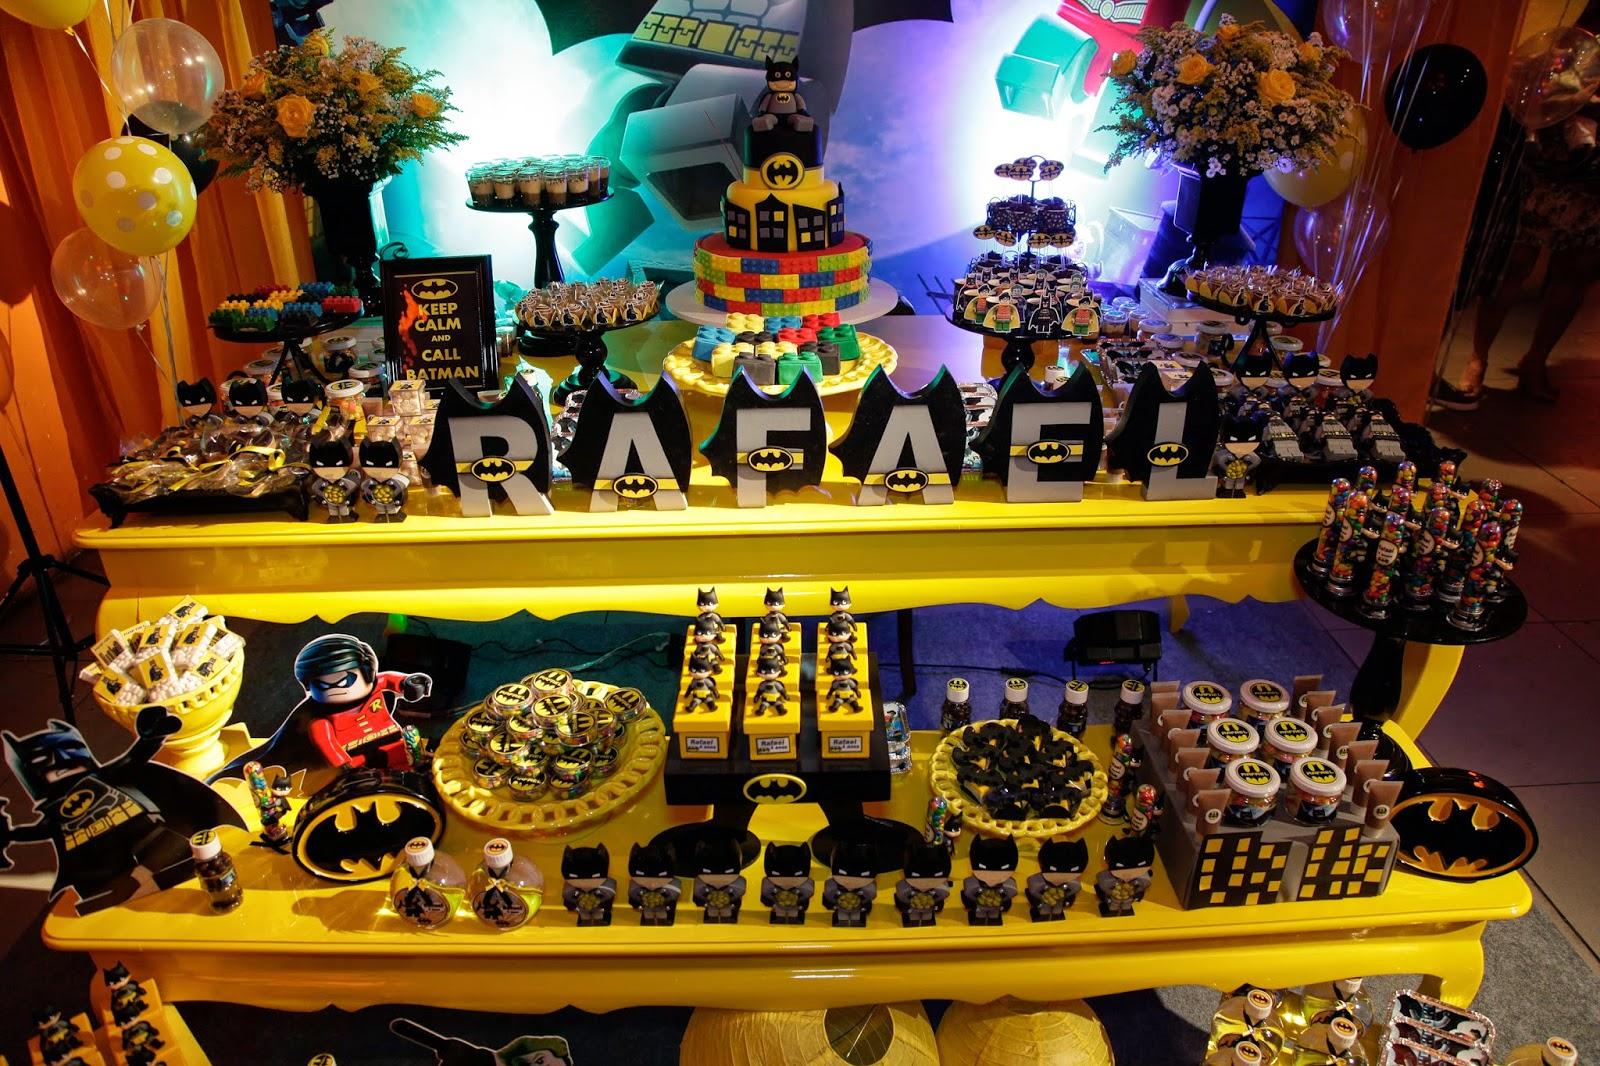 festa-lego-batman-2.jpg